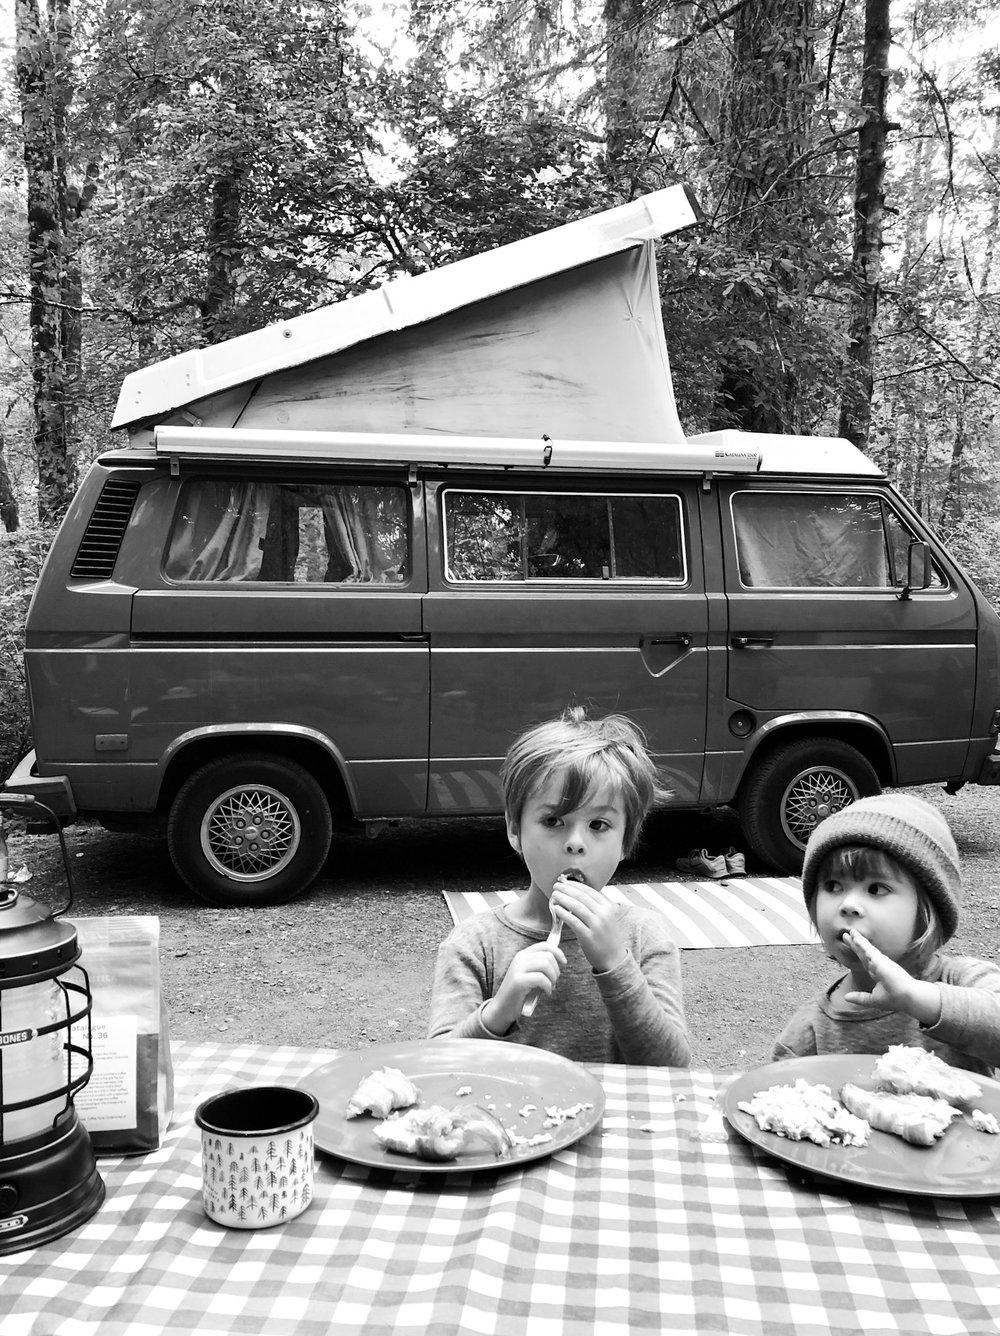 600sqftandababy_westfalia_camping_van